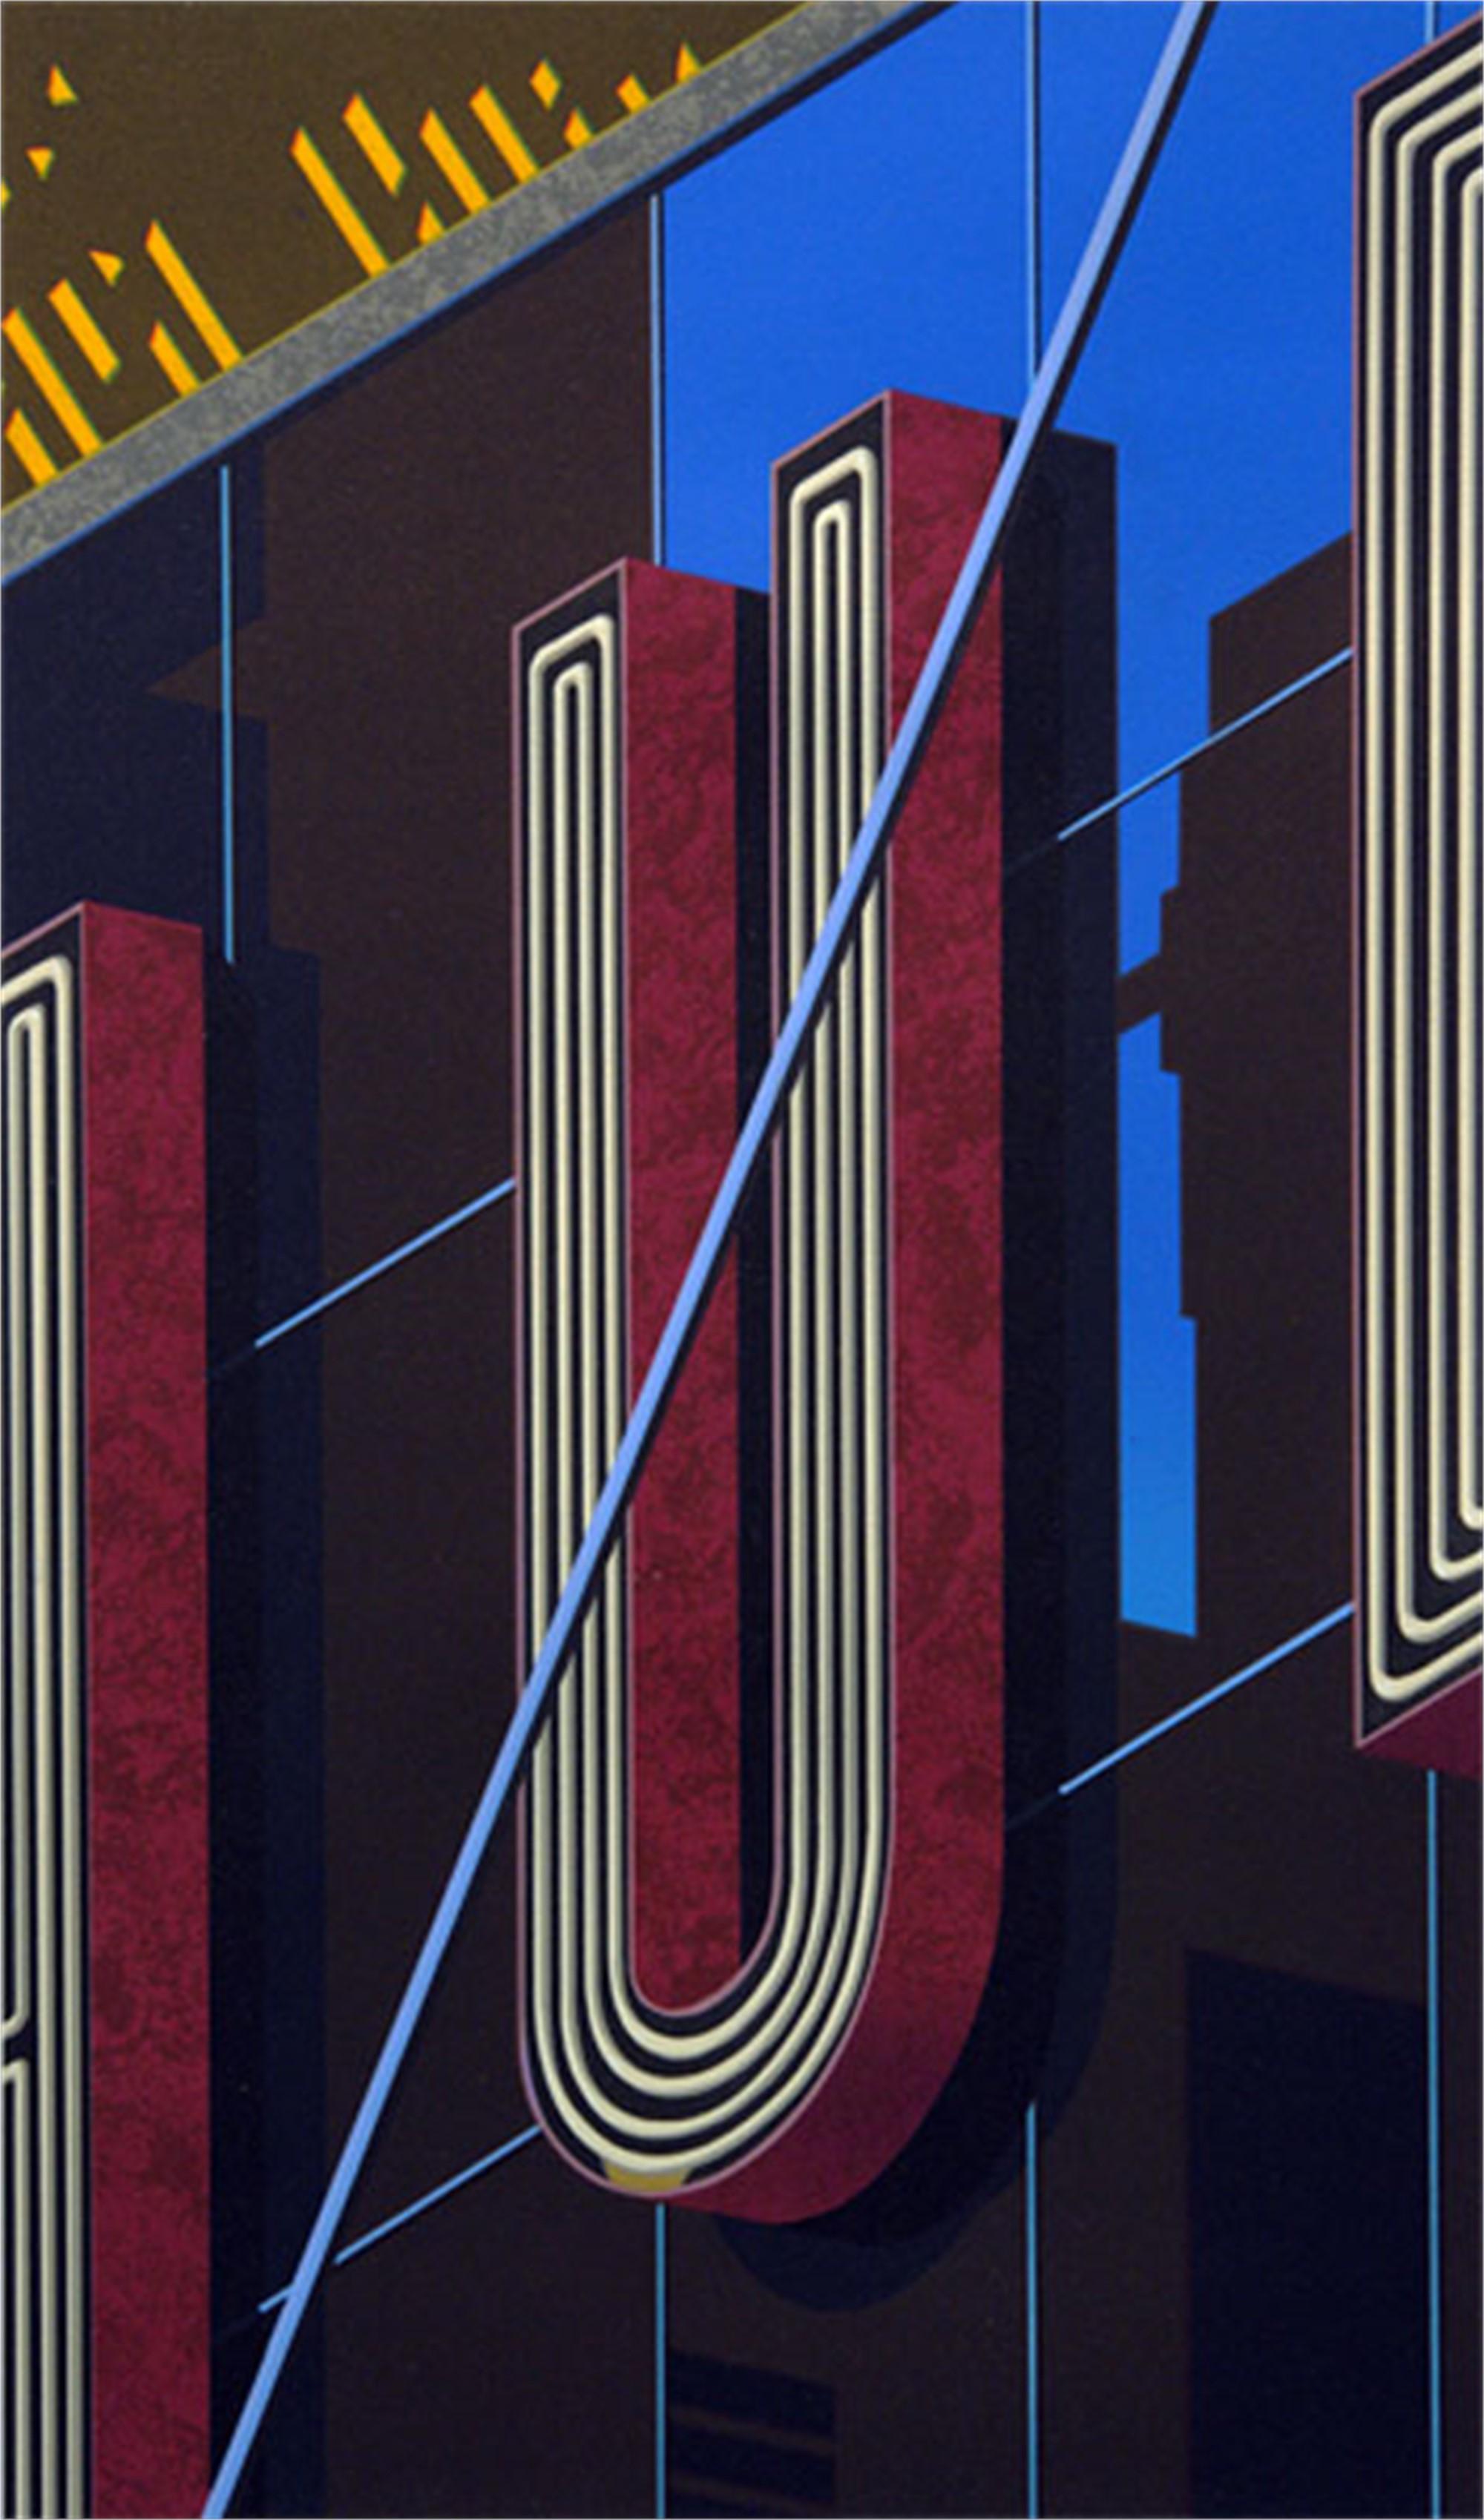 An American Alphabet: U by Robert Cottingham